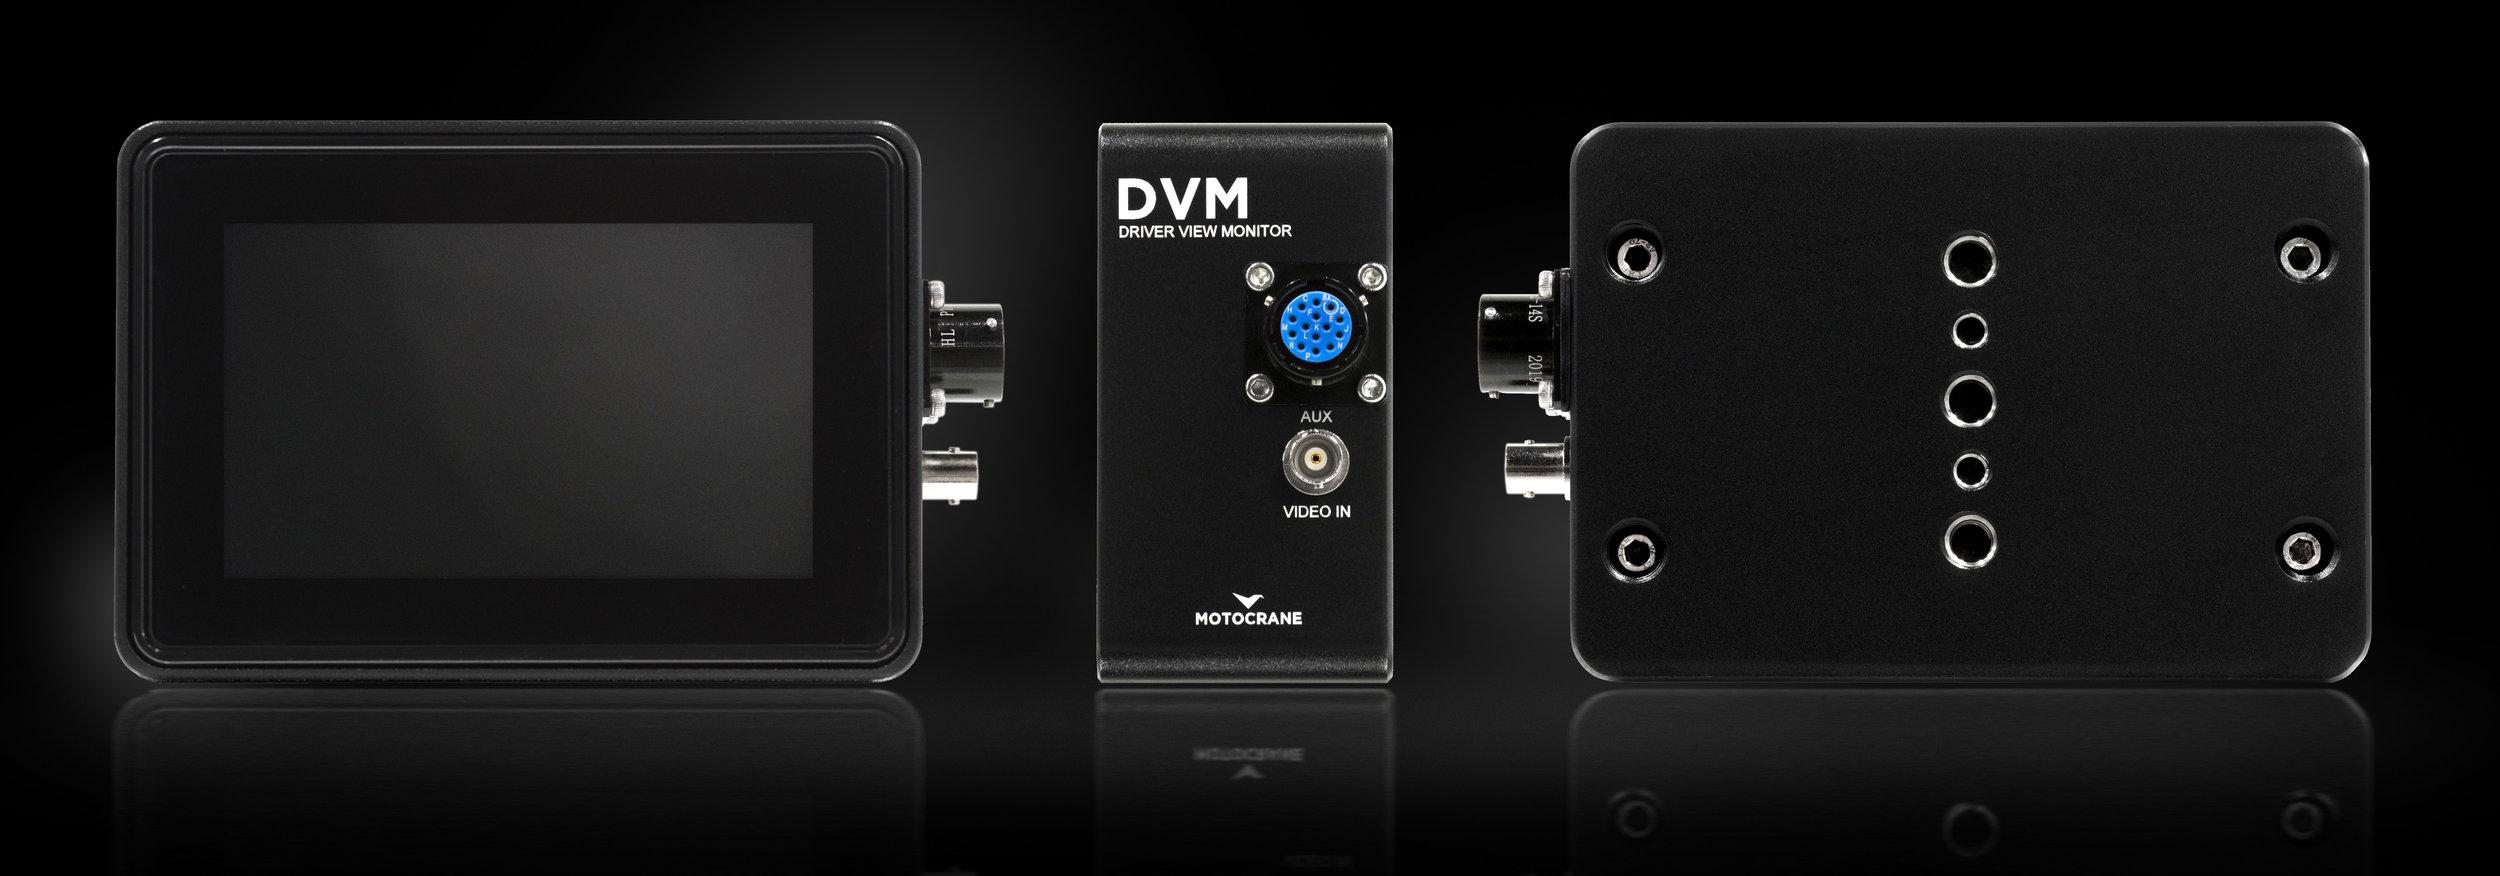 DVM_Profiles_Blk.jpg